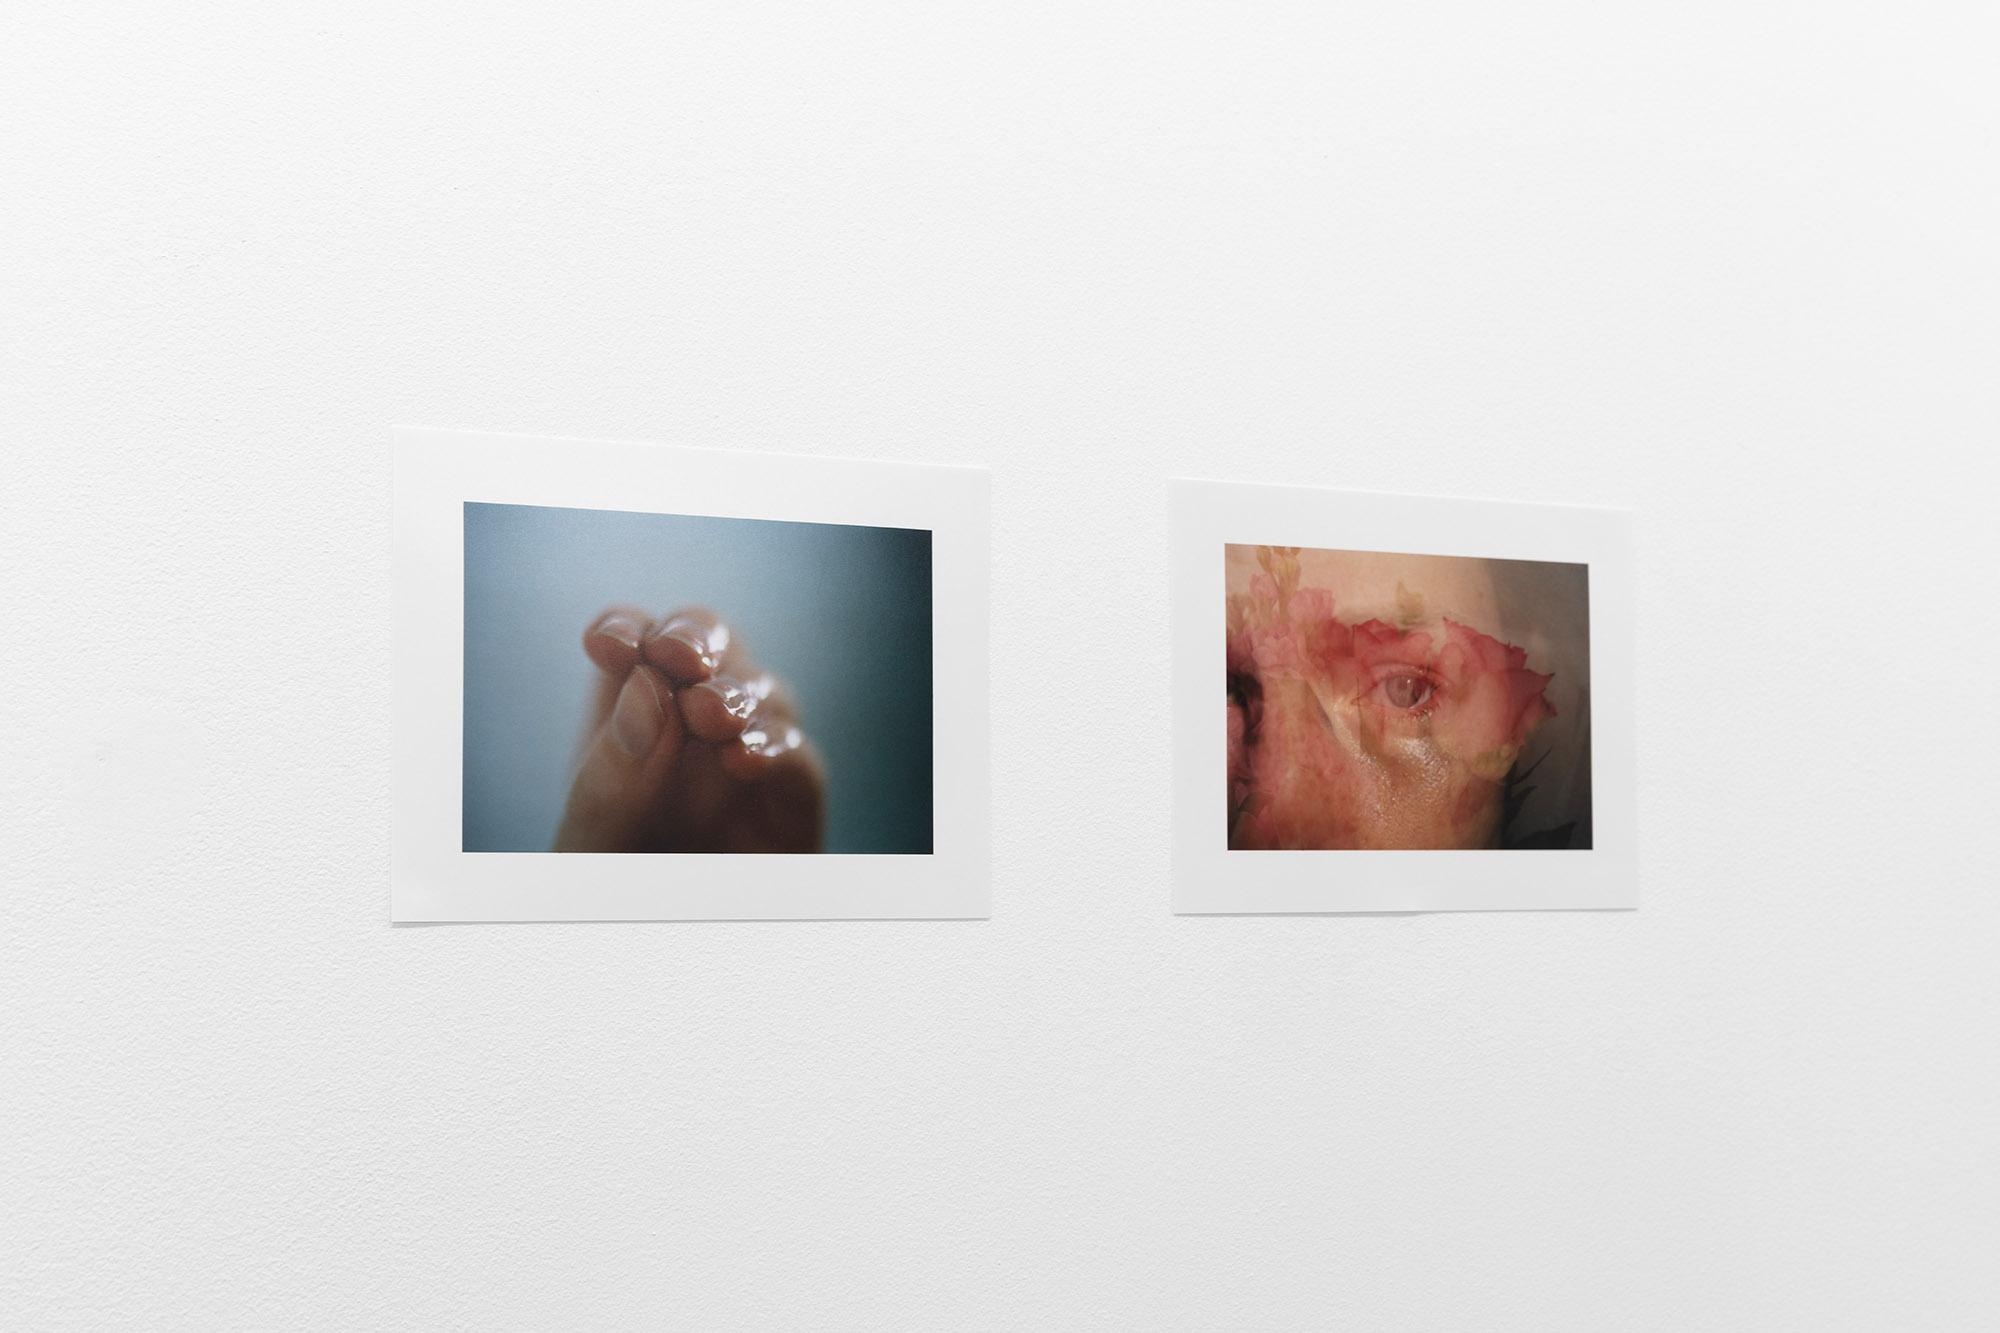 Lina Scheynius - Crystalline - MELK 2019